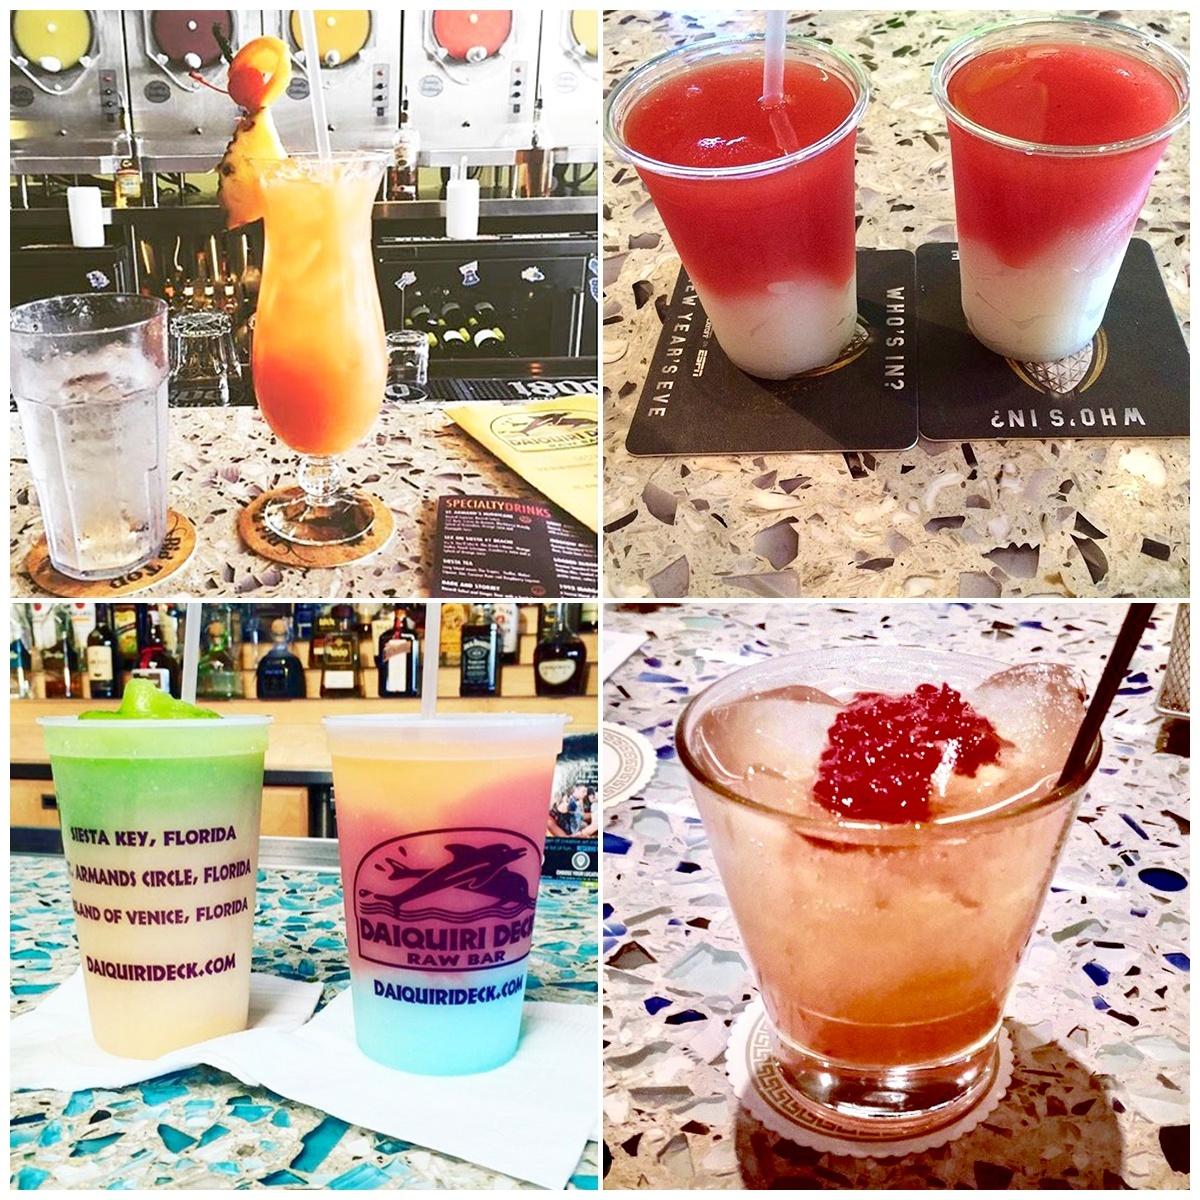 cocktails-on-vetrazzo-counters-instagram